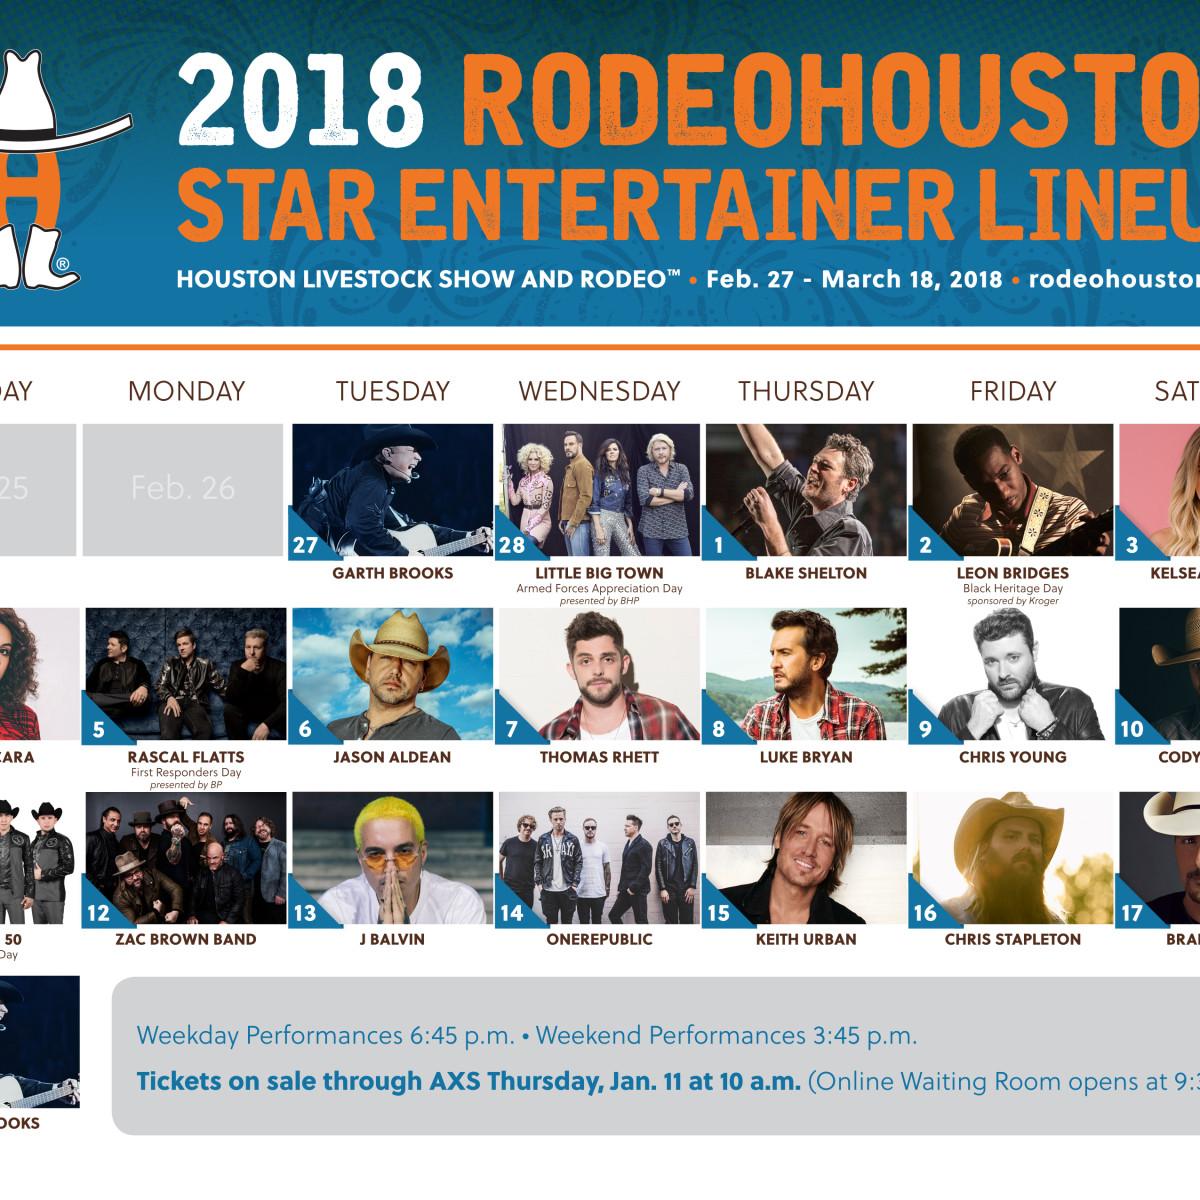 Rodeo_Houston_2018_Lineup